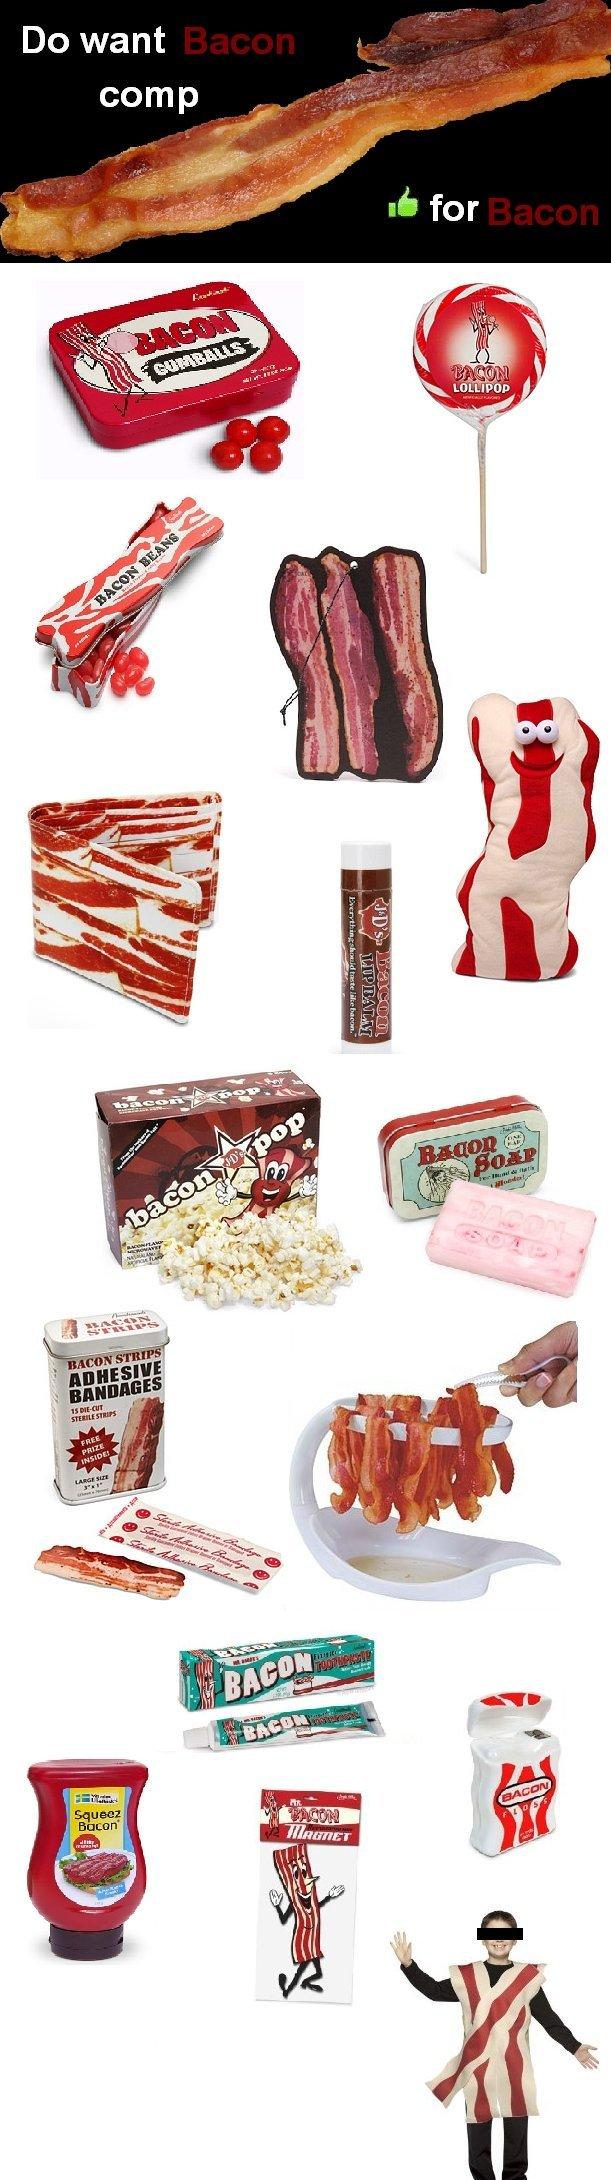 Do want bacon comp 1. Bacon make the world go round.. Bacon comp do want funny